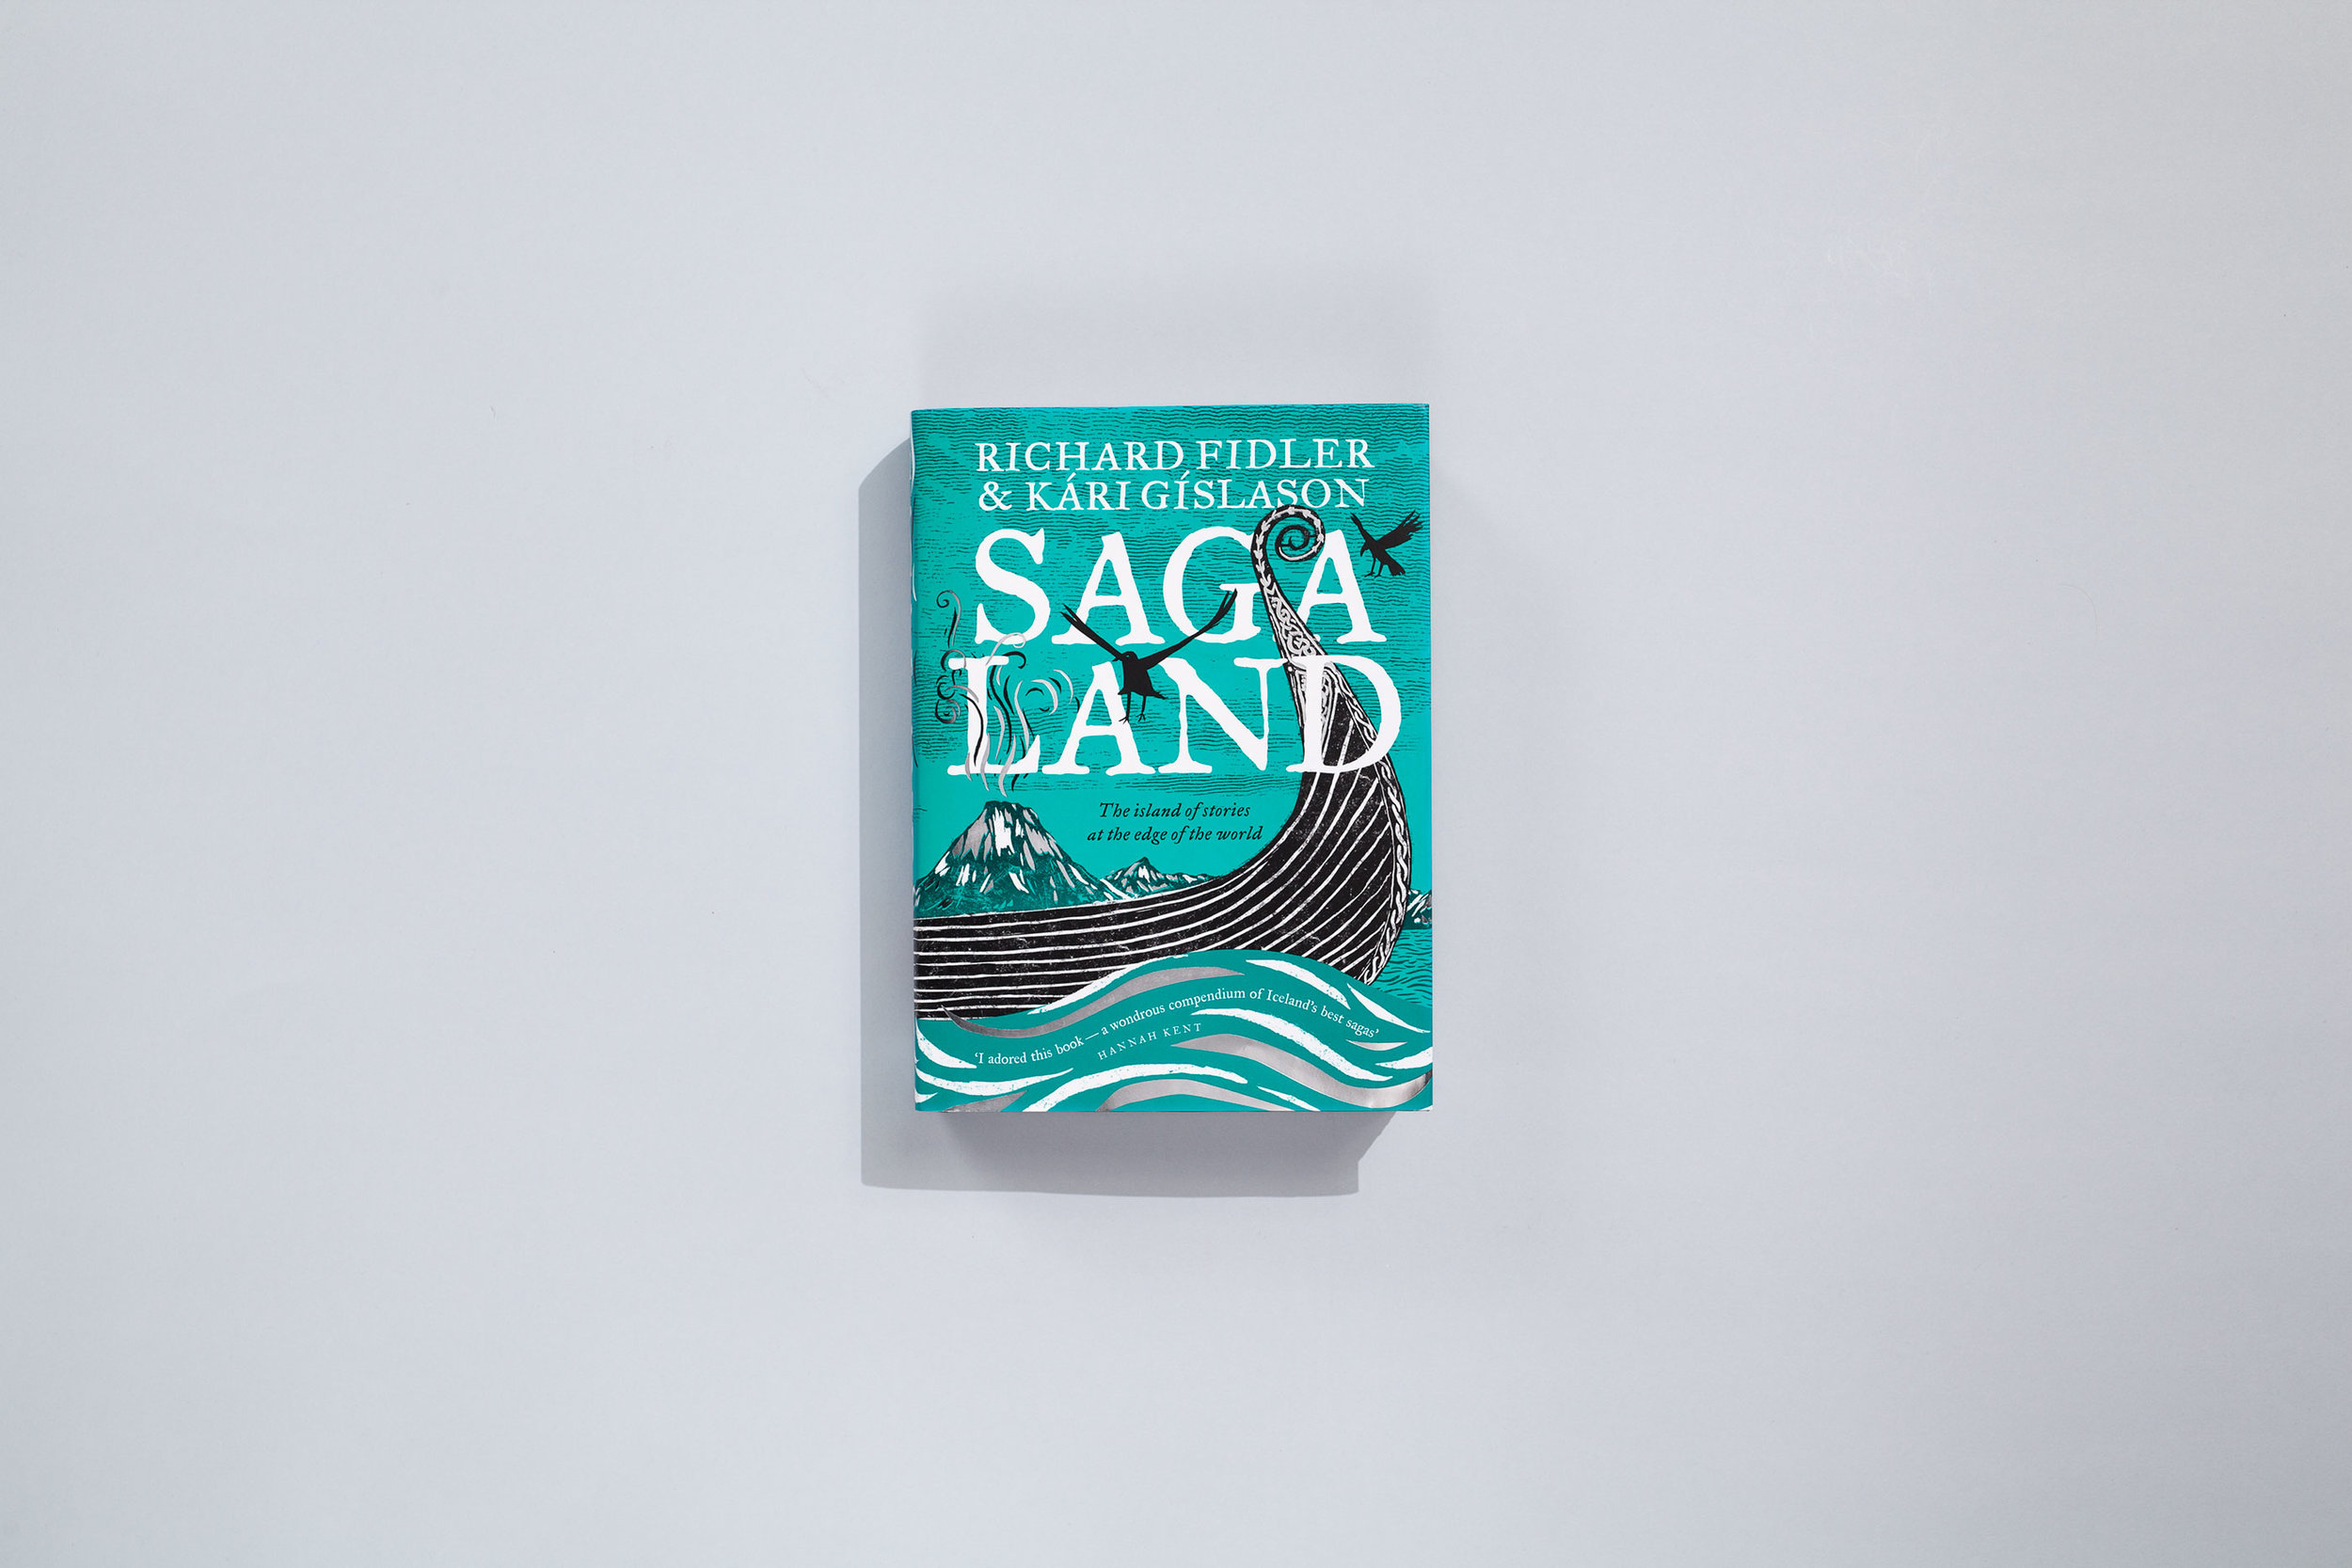 Title – Saga Land Authors – Richard Fidler & Kari Gislason Designers – Daniel New & Evi O / OetomoNew Cover illustrator – Daniel New Map illustrator – Clare O'Flynn Publisher – ABC Books